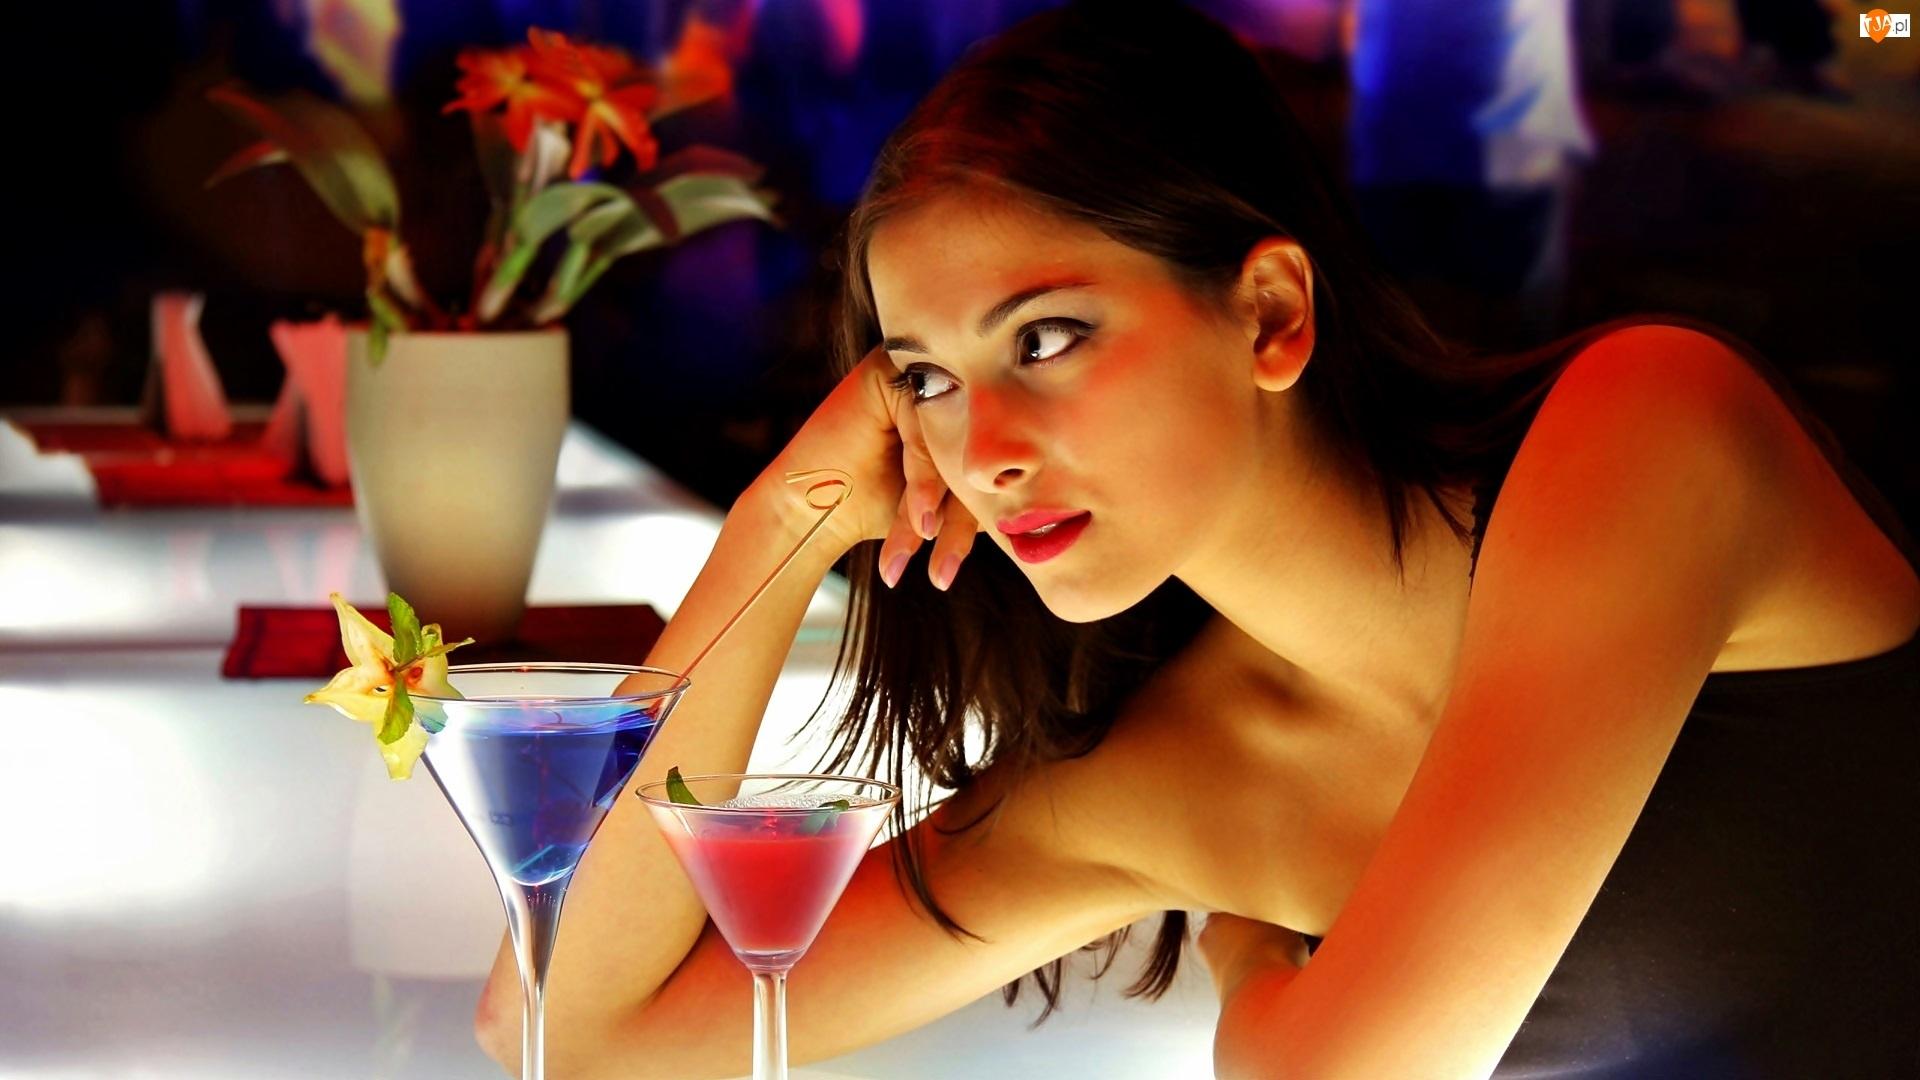 Piękna, Drinki, Kobieta, Bar